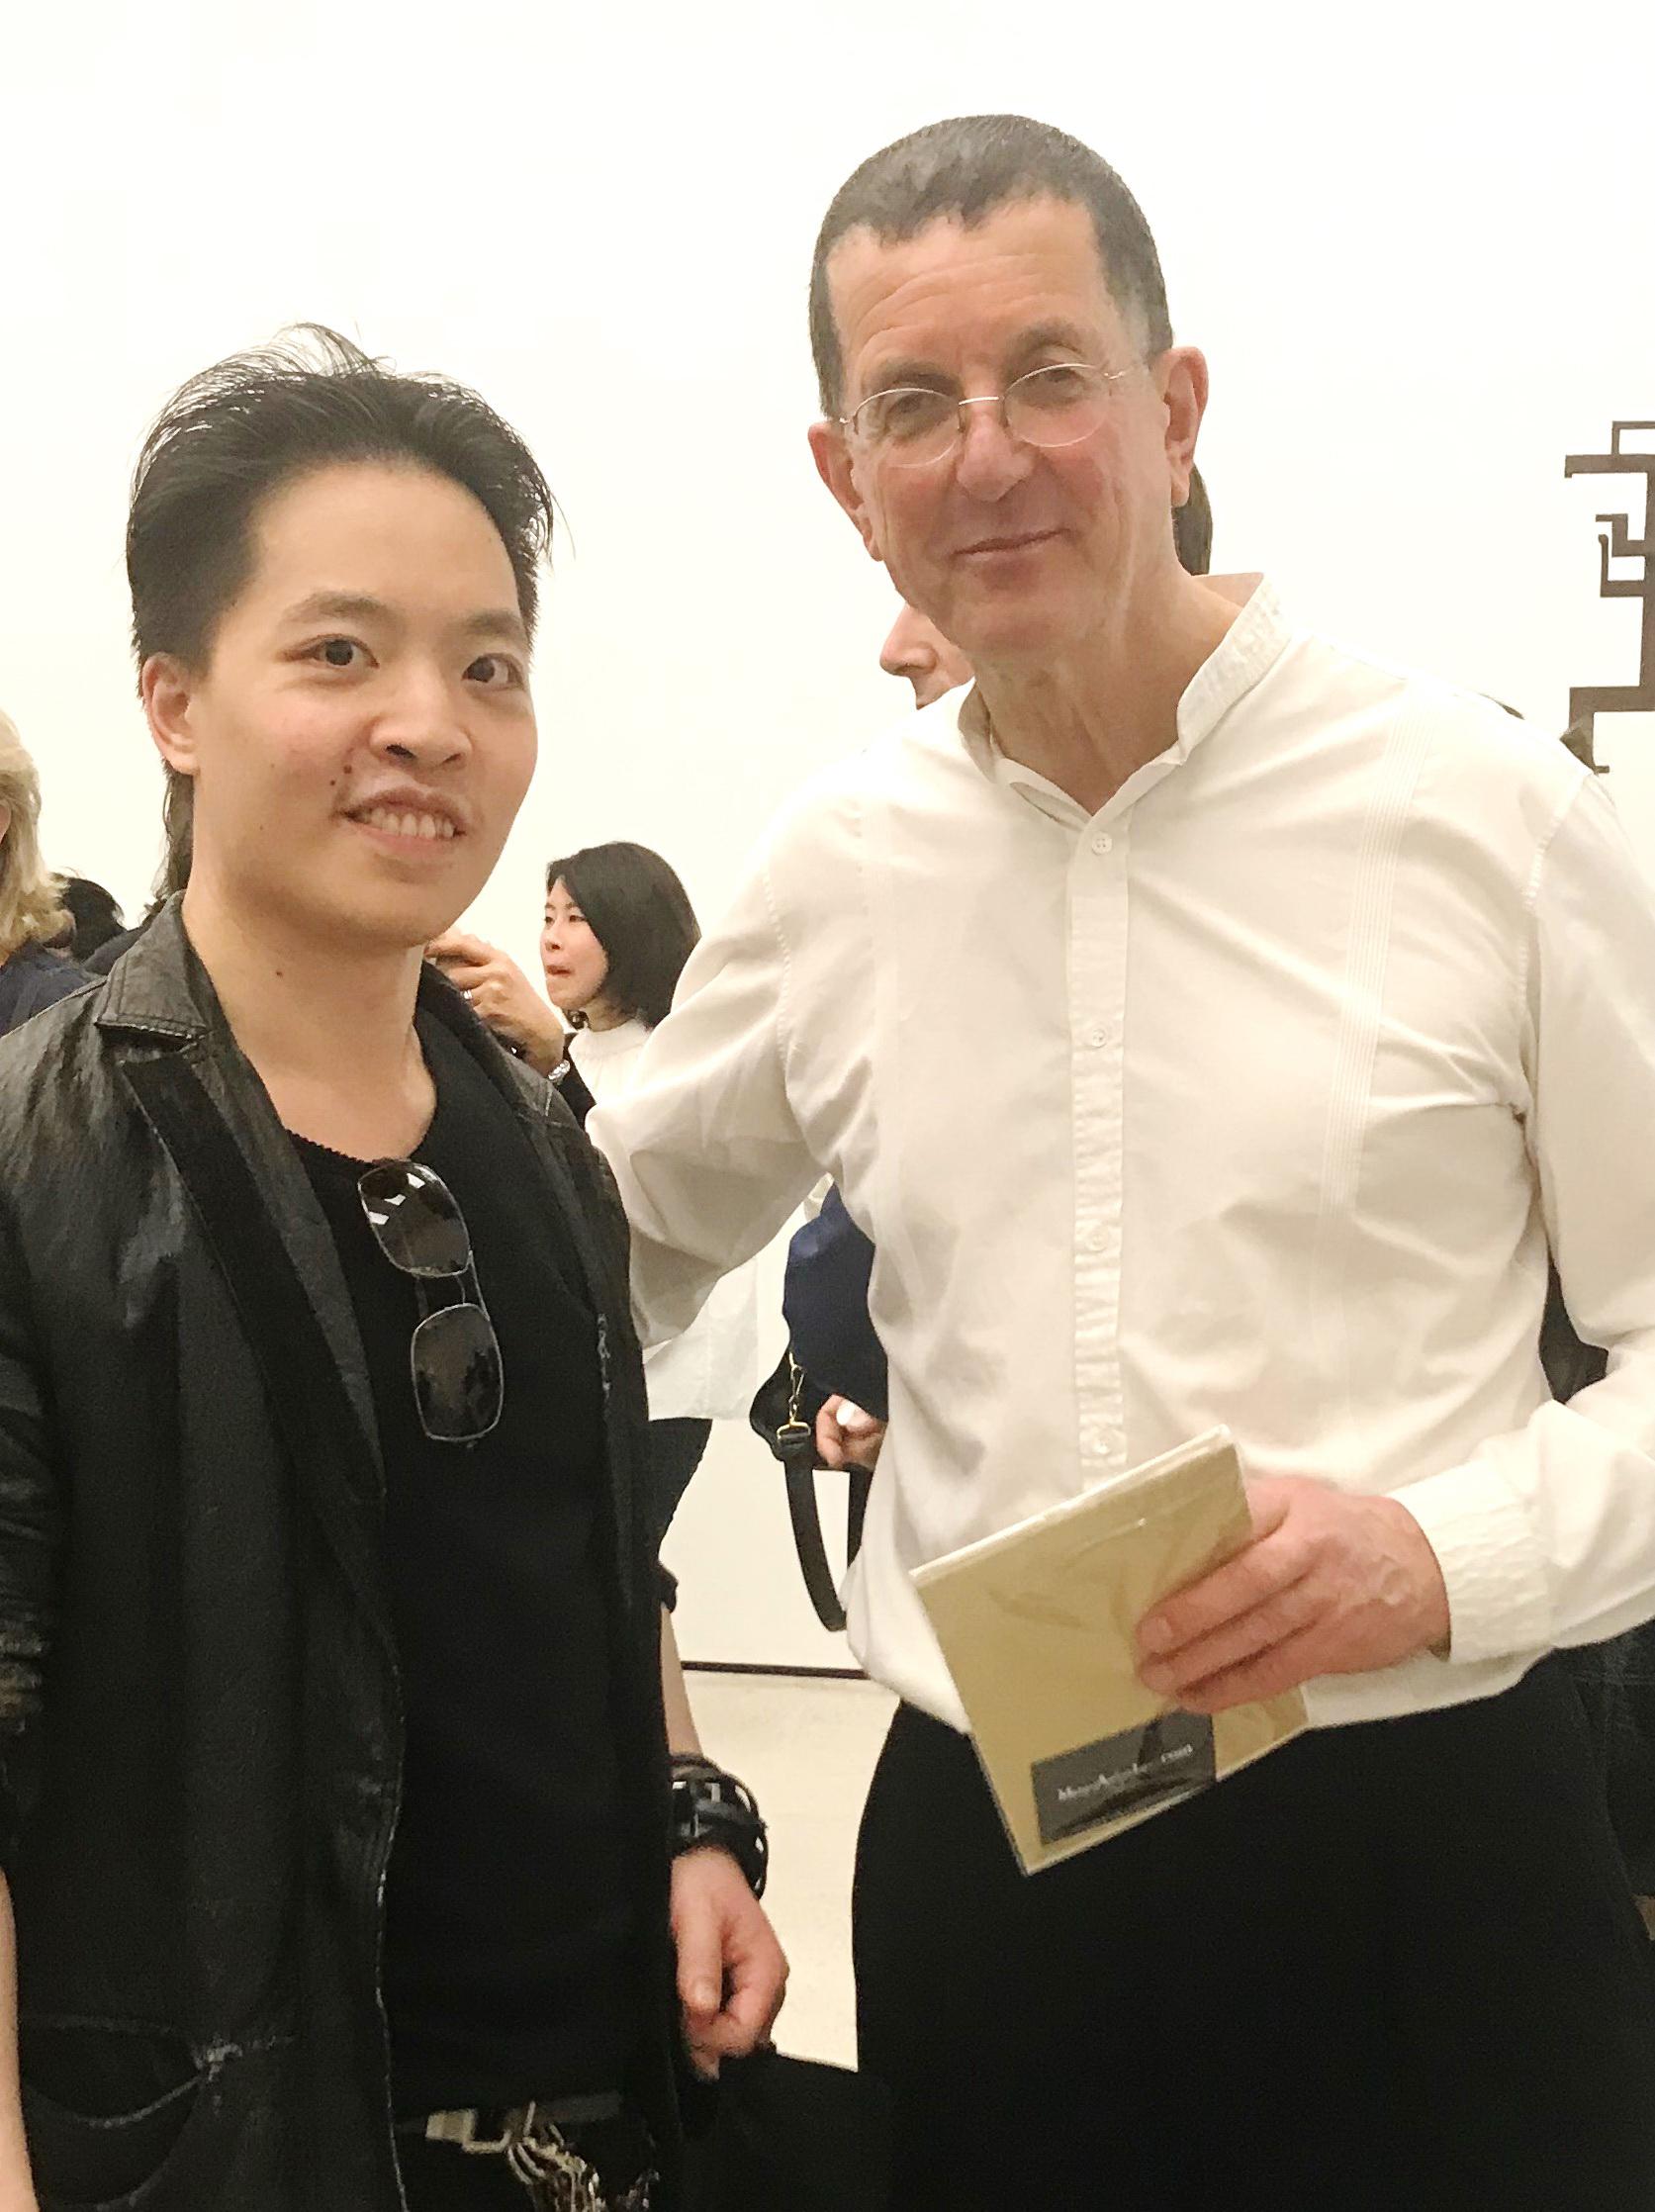 羅卓睿 Michael Andrew Law Cheuk Yui 與著名藝術家 安東尼·戈姆利 Antony Gormley